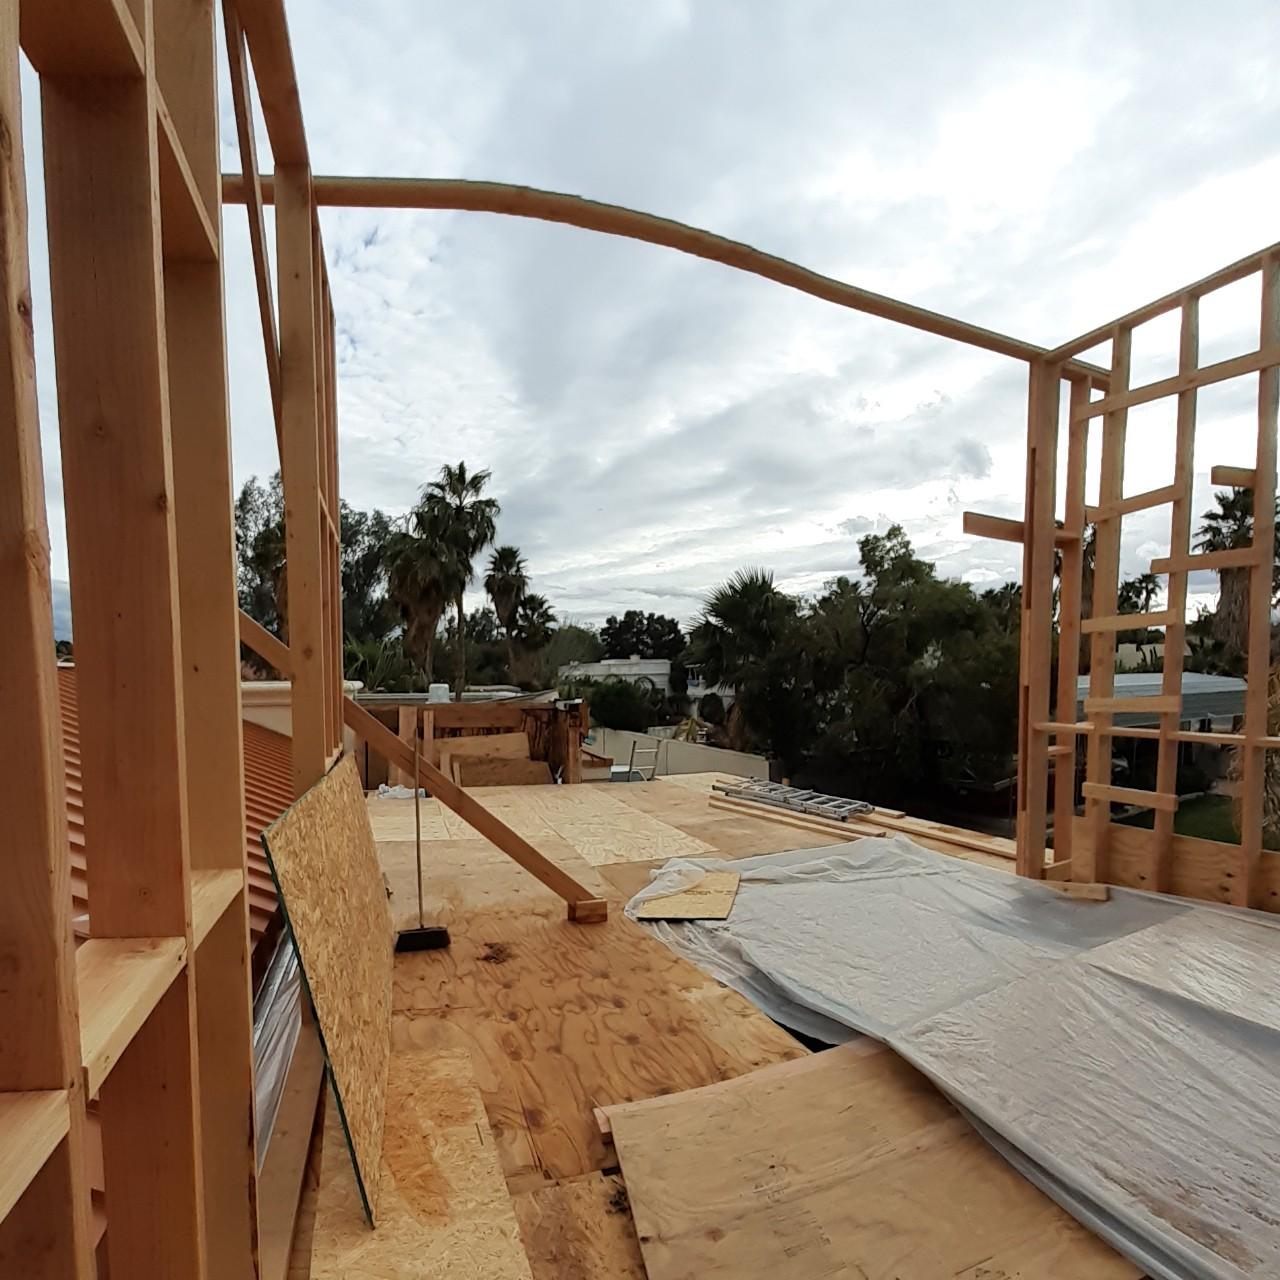 carpentry-wood-framing-second-floor-home-addition--framing-83